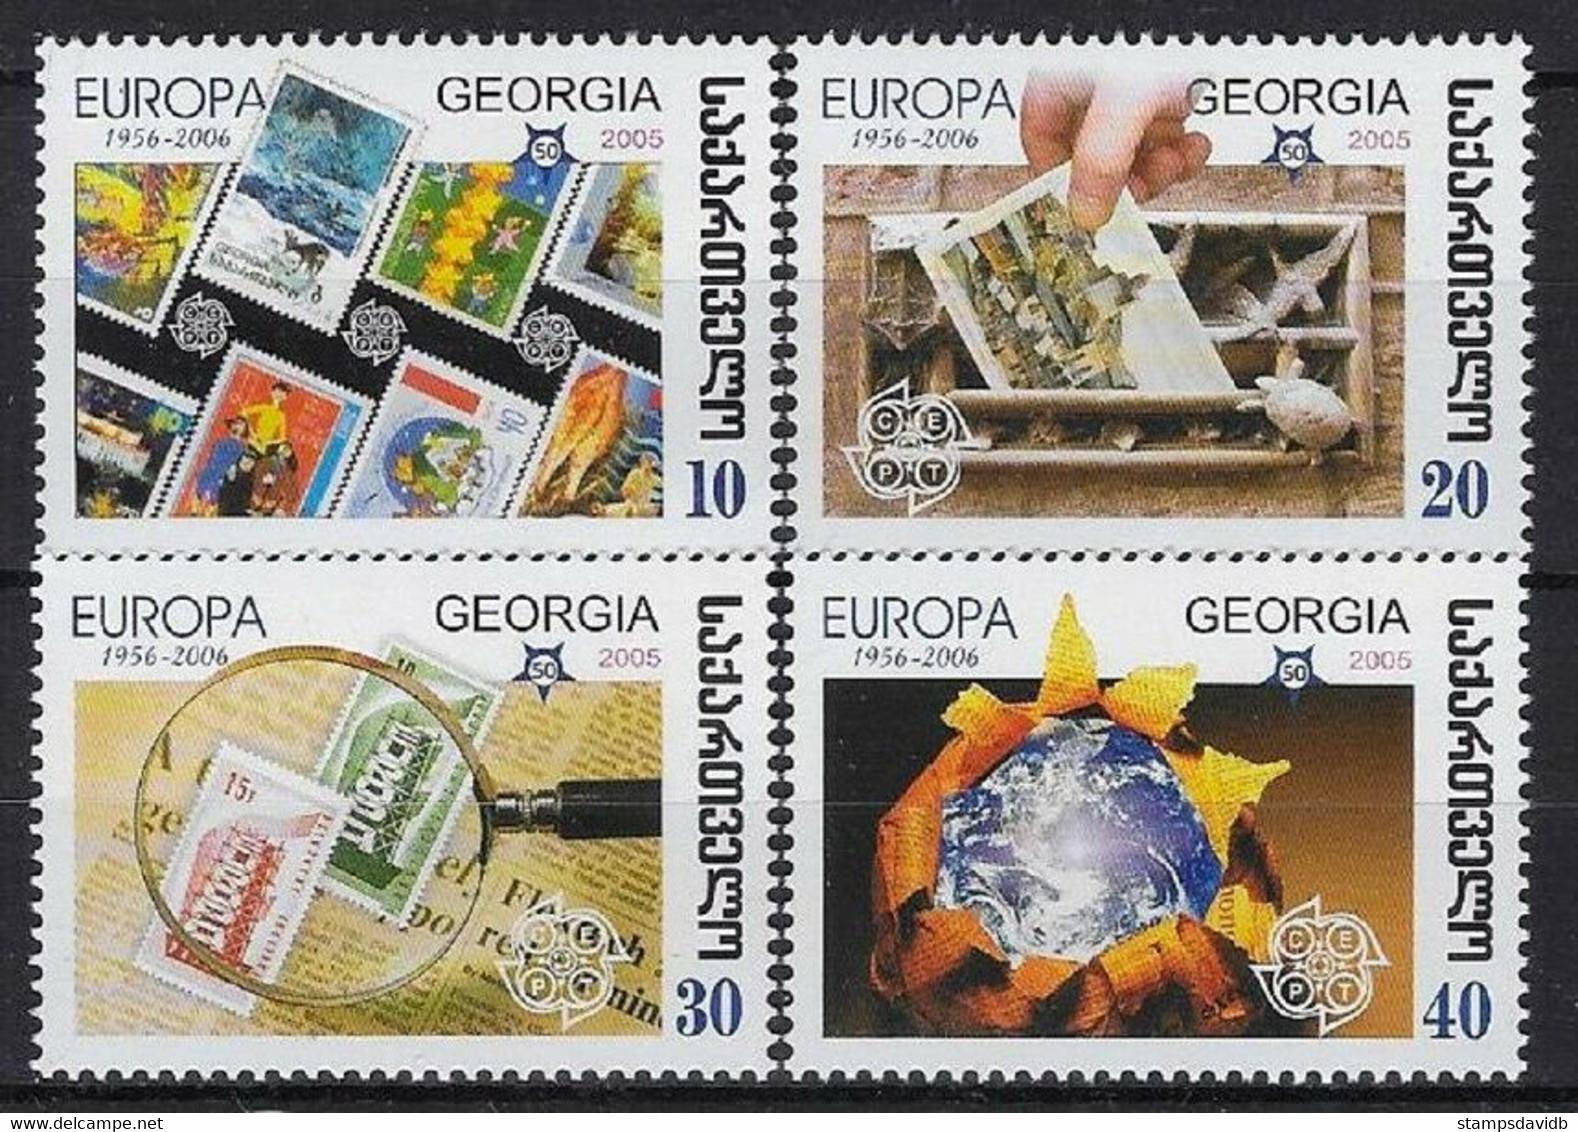 2006Georgia507-51050 Years Of The European Union 4,00 € - 2006